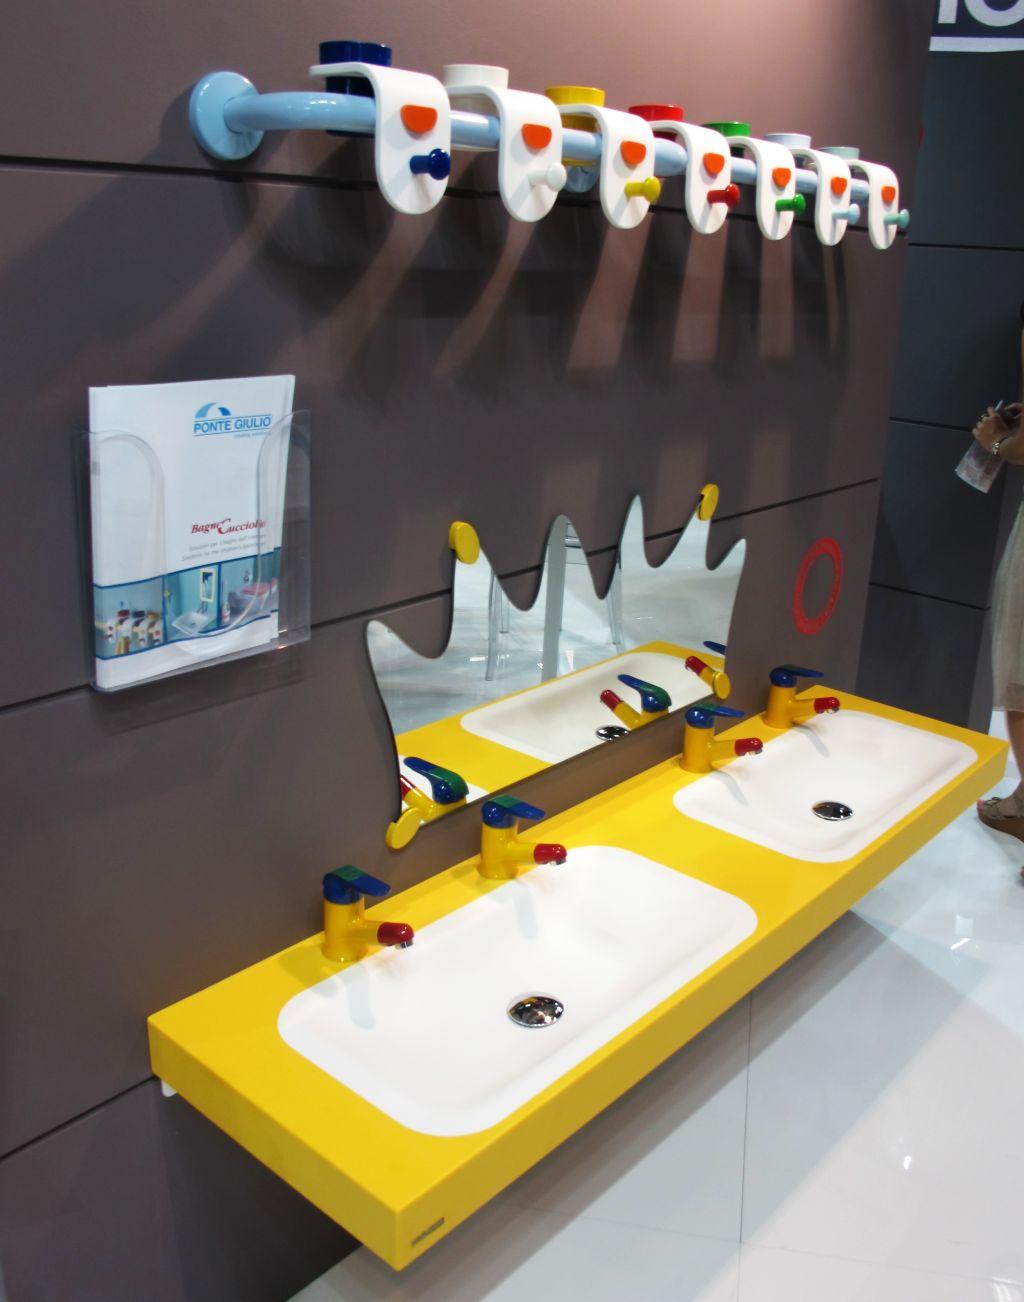 Lavoare si accesorii  pentru copii model Bogno Cuciolo de la Ponte Giulio